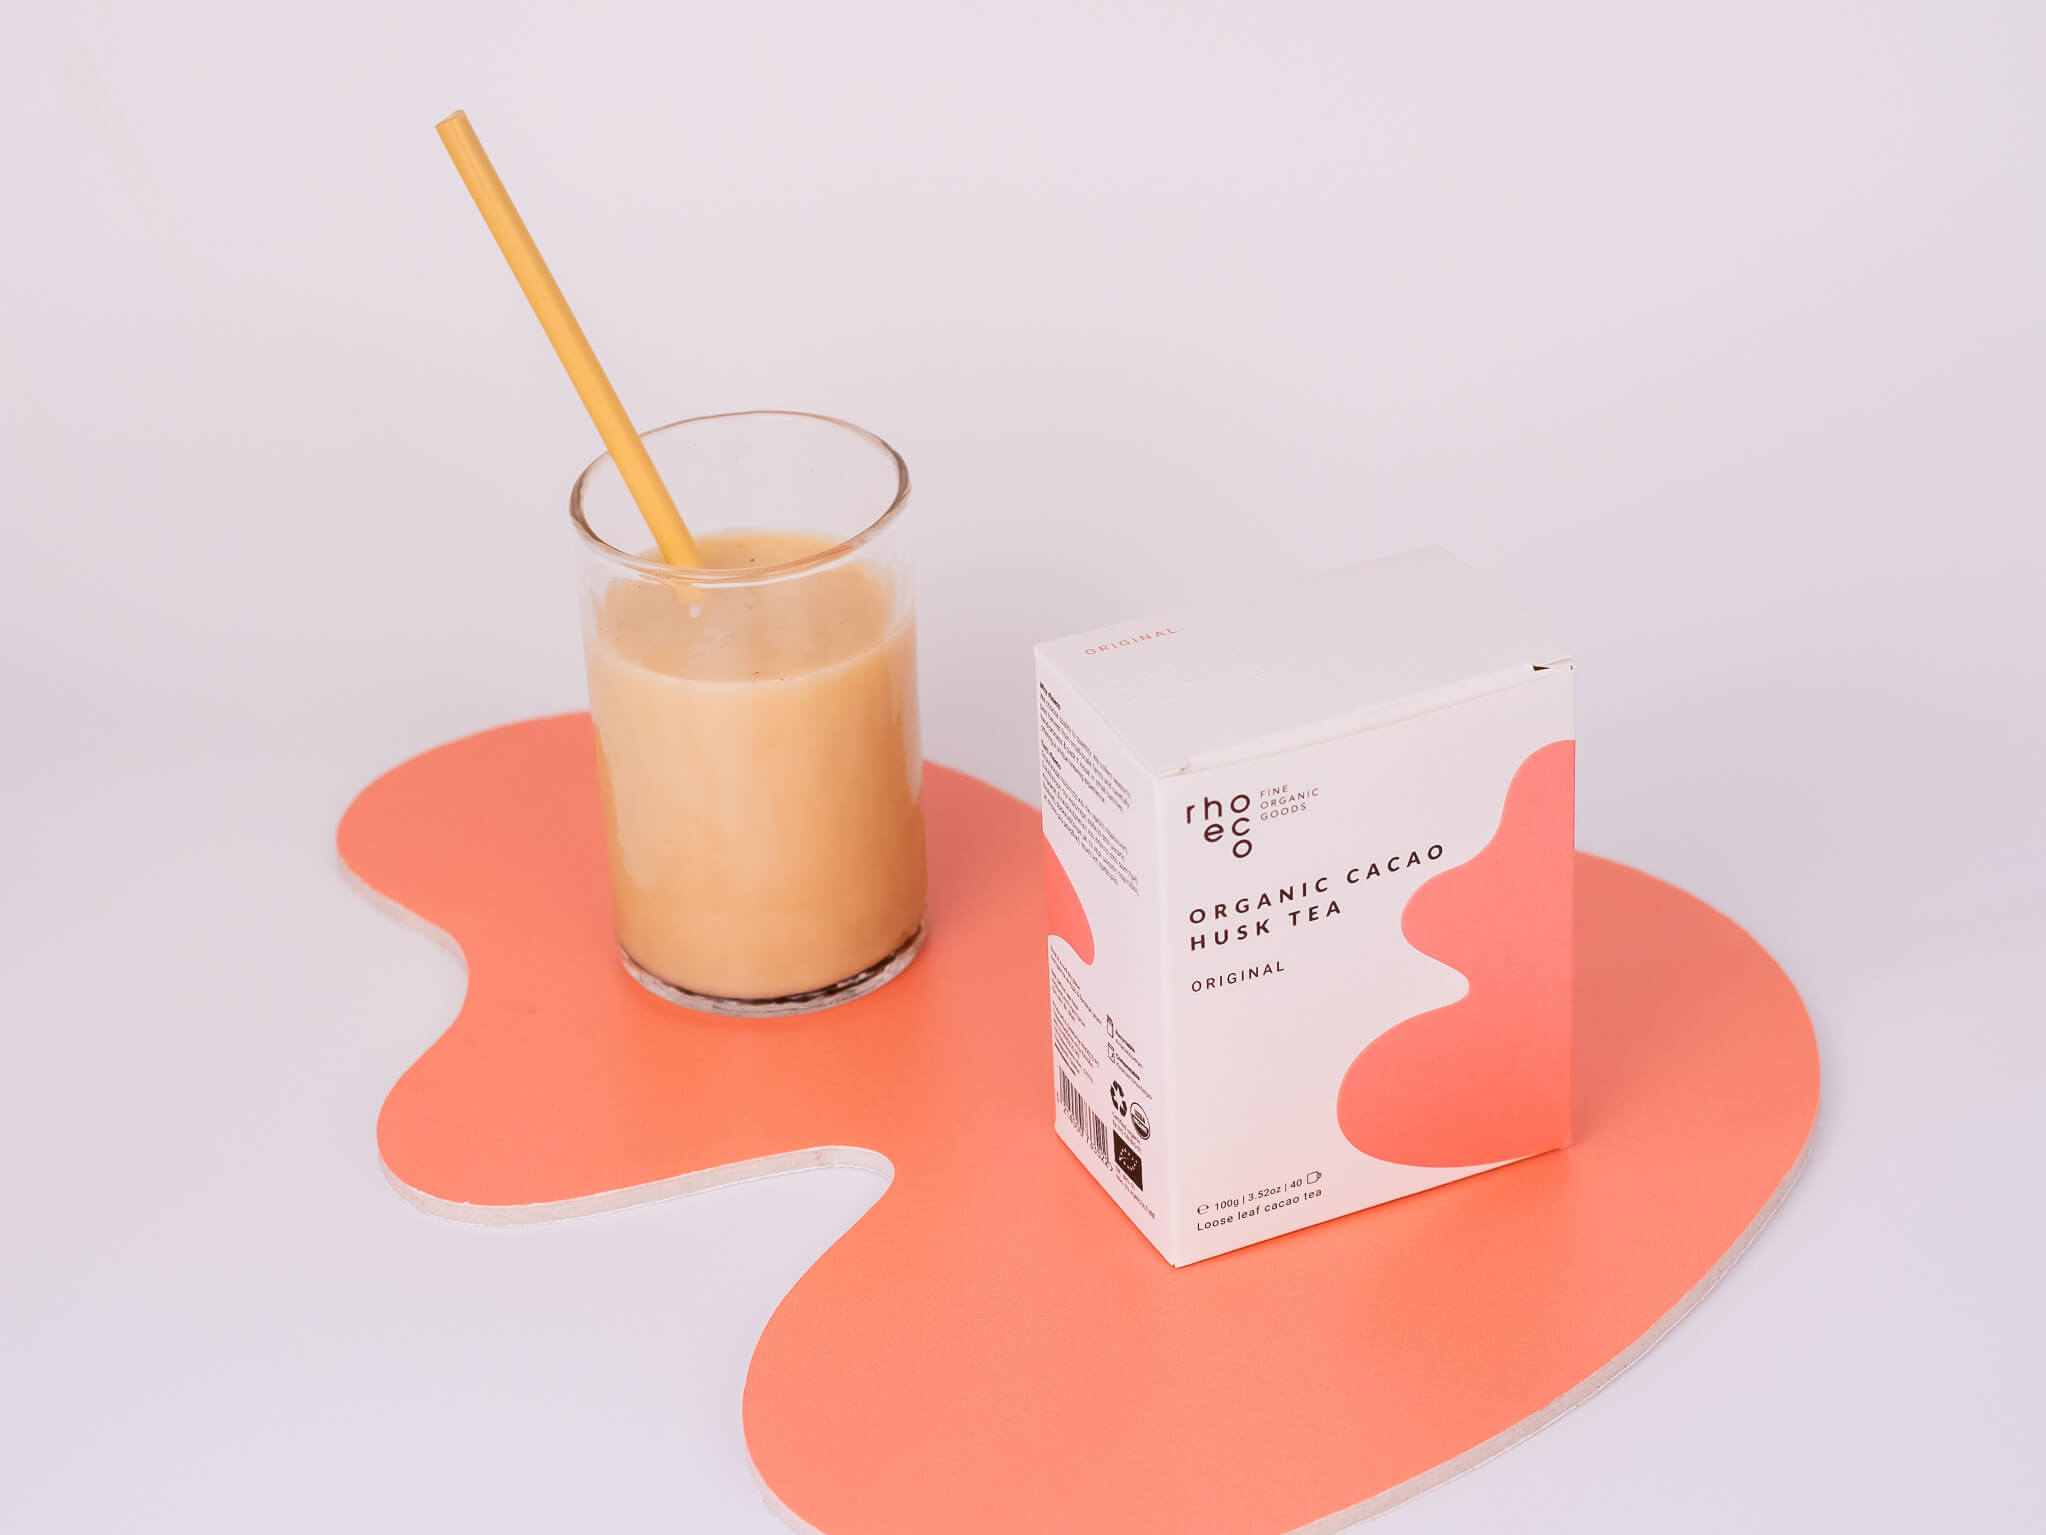 organic cacao husk tea latte